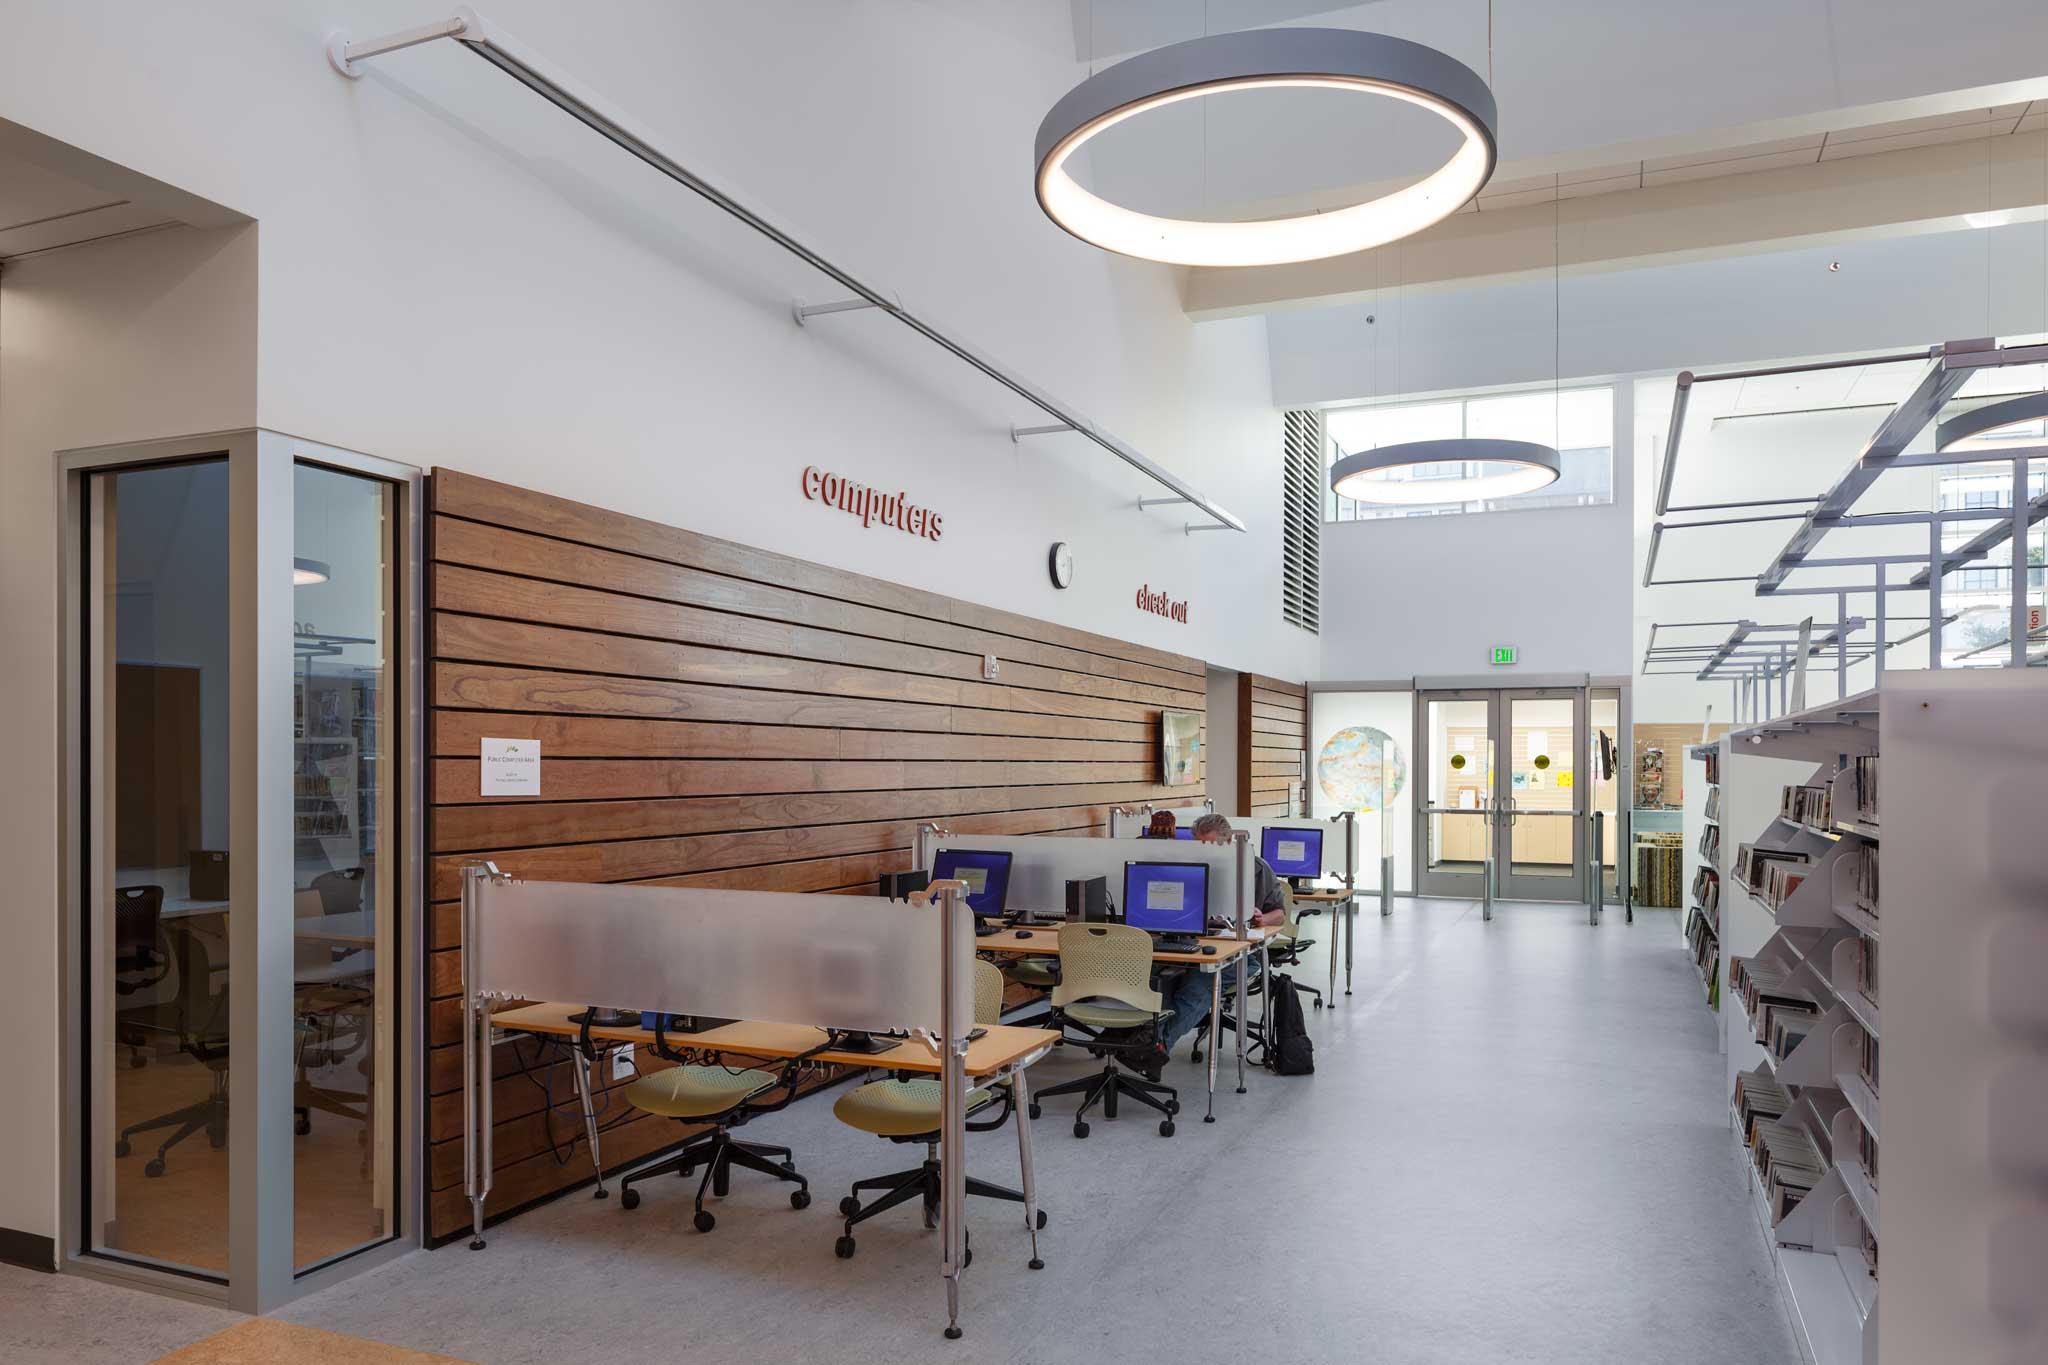 Library Public Area Lighting Design